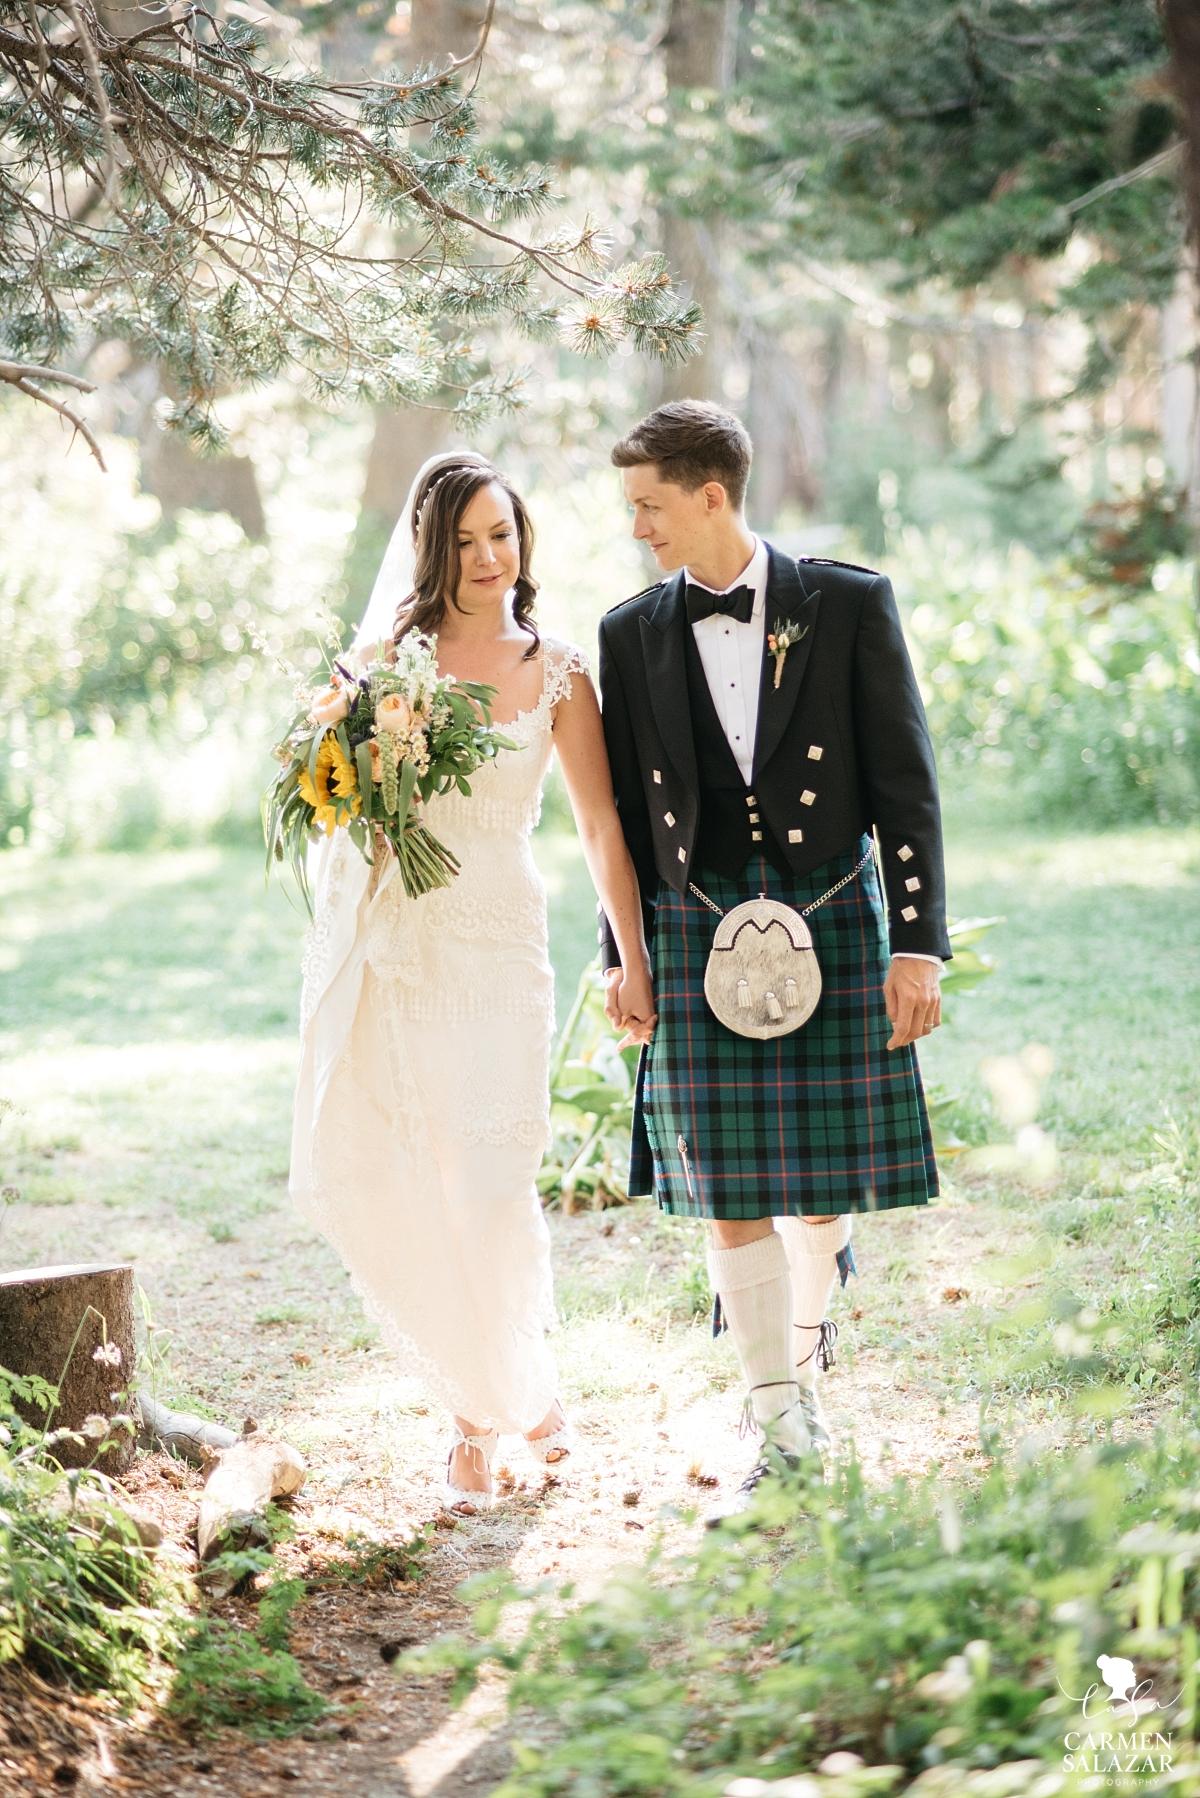 Rustic Scottish Themed Wedding In Tahoe Carmen Salazar